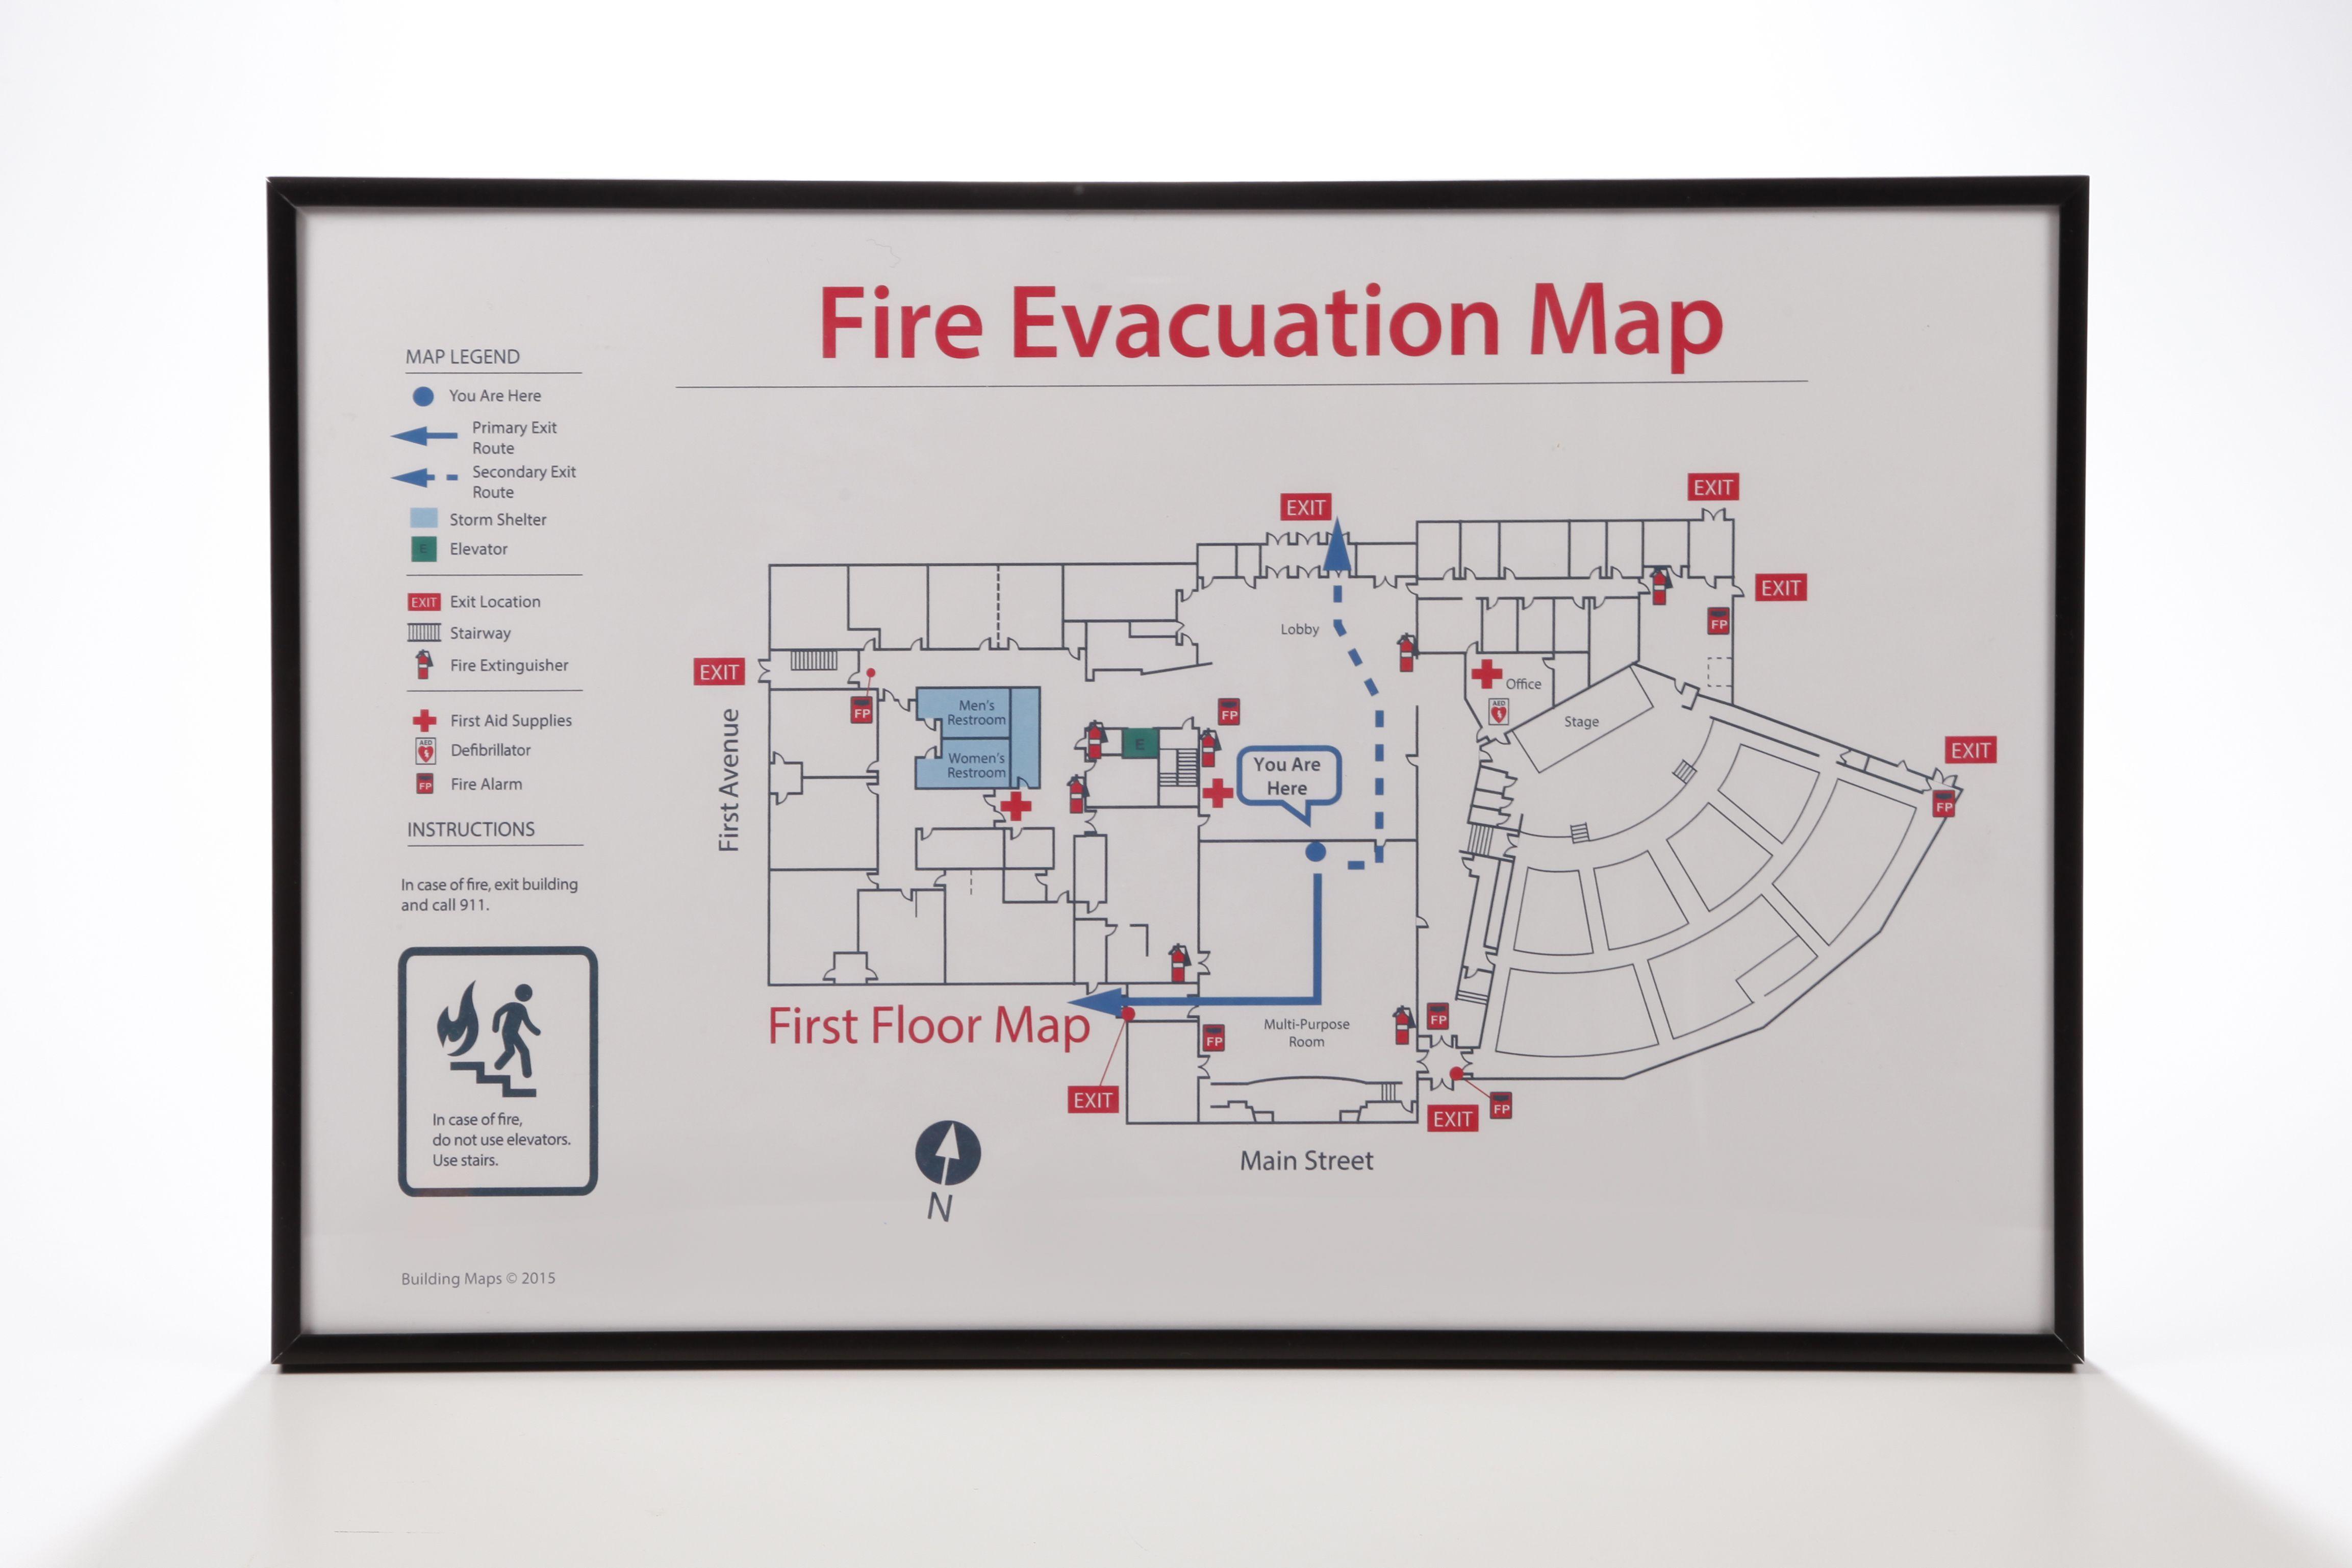 medium resolution of building signs diagram wiring diagram toolbox building signs diagram